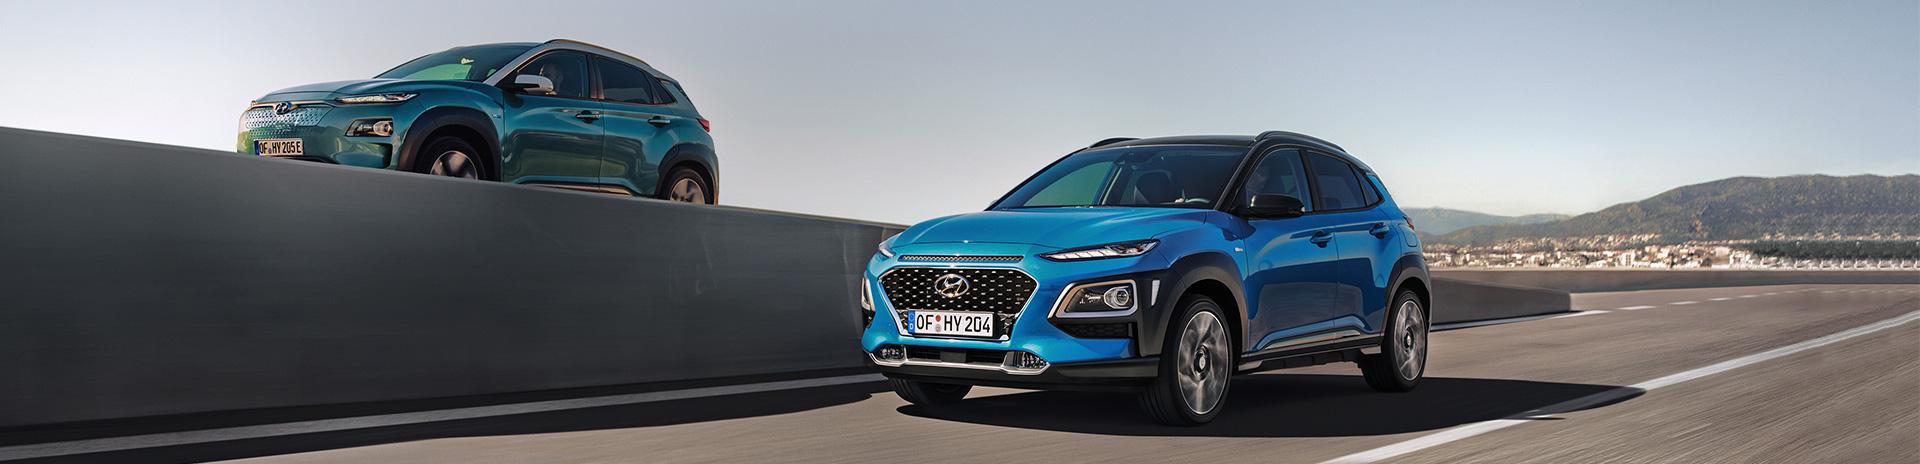 Új Hyundai Kona Hybrid